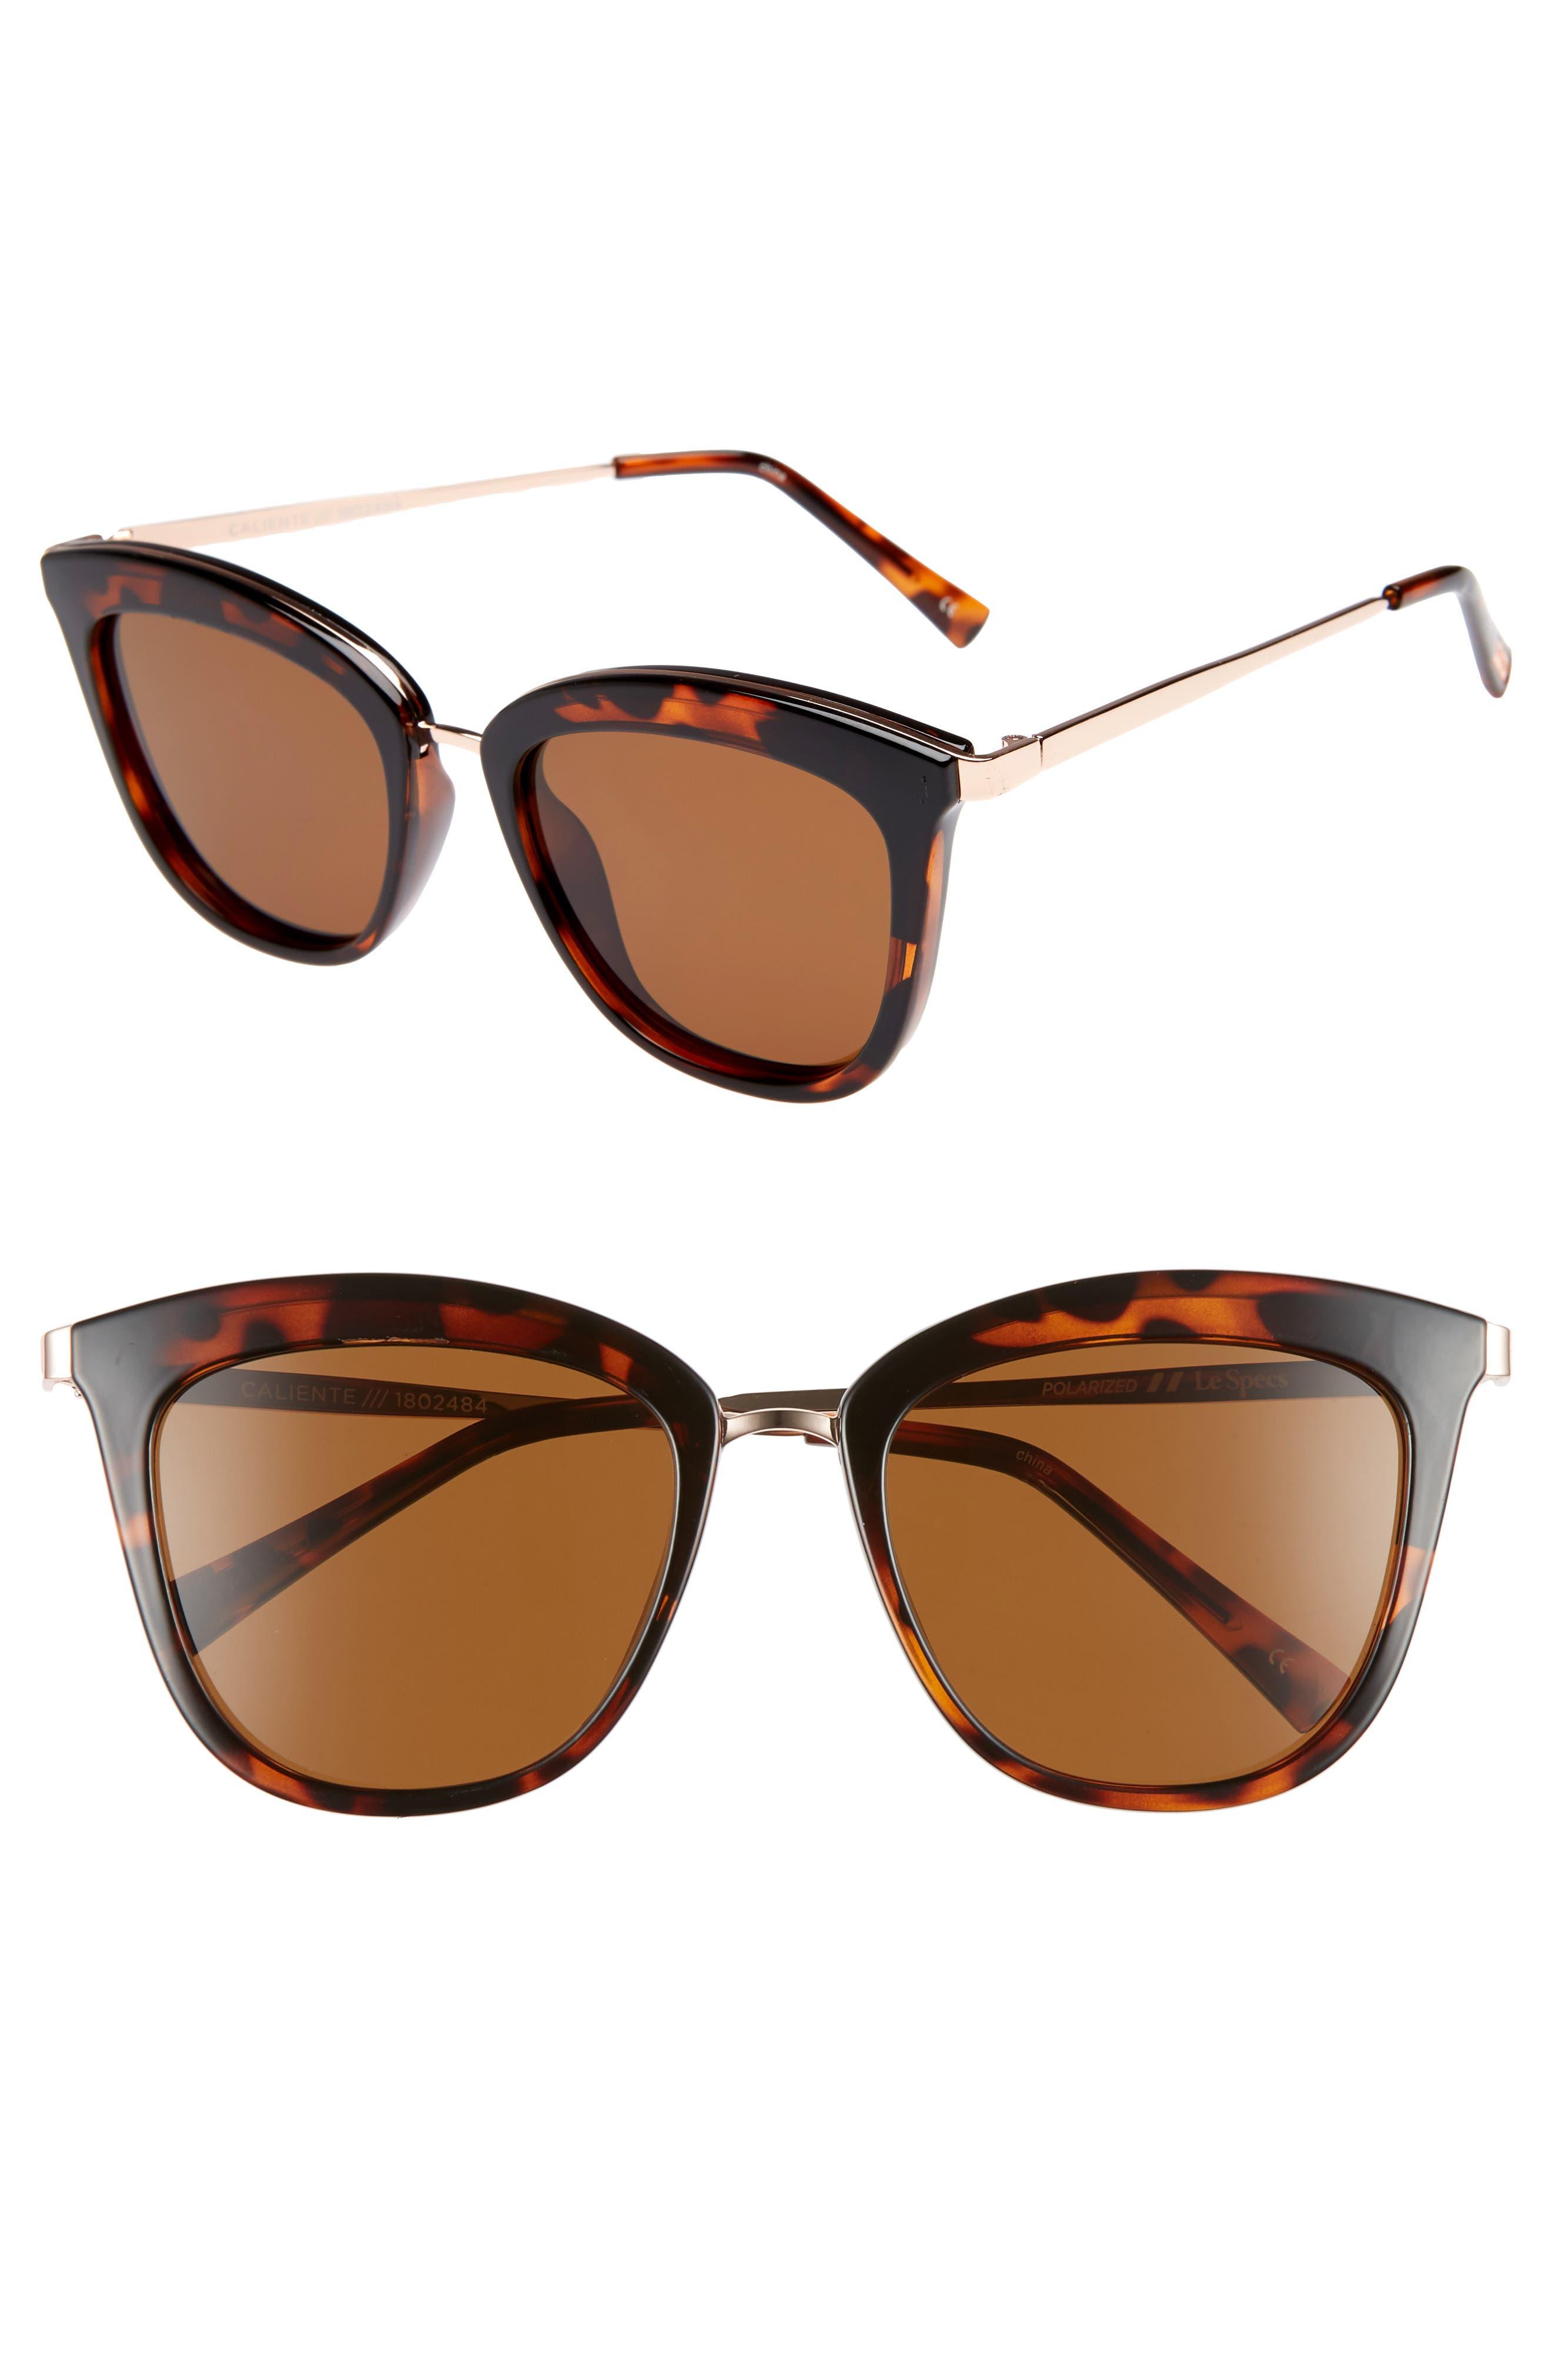 Le Specs Caliente 5m Polarized Cat Eye Sunglasses - Tortoise / Rose Gold